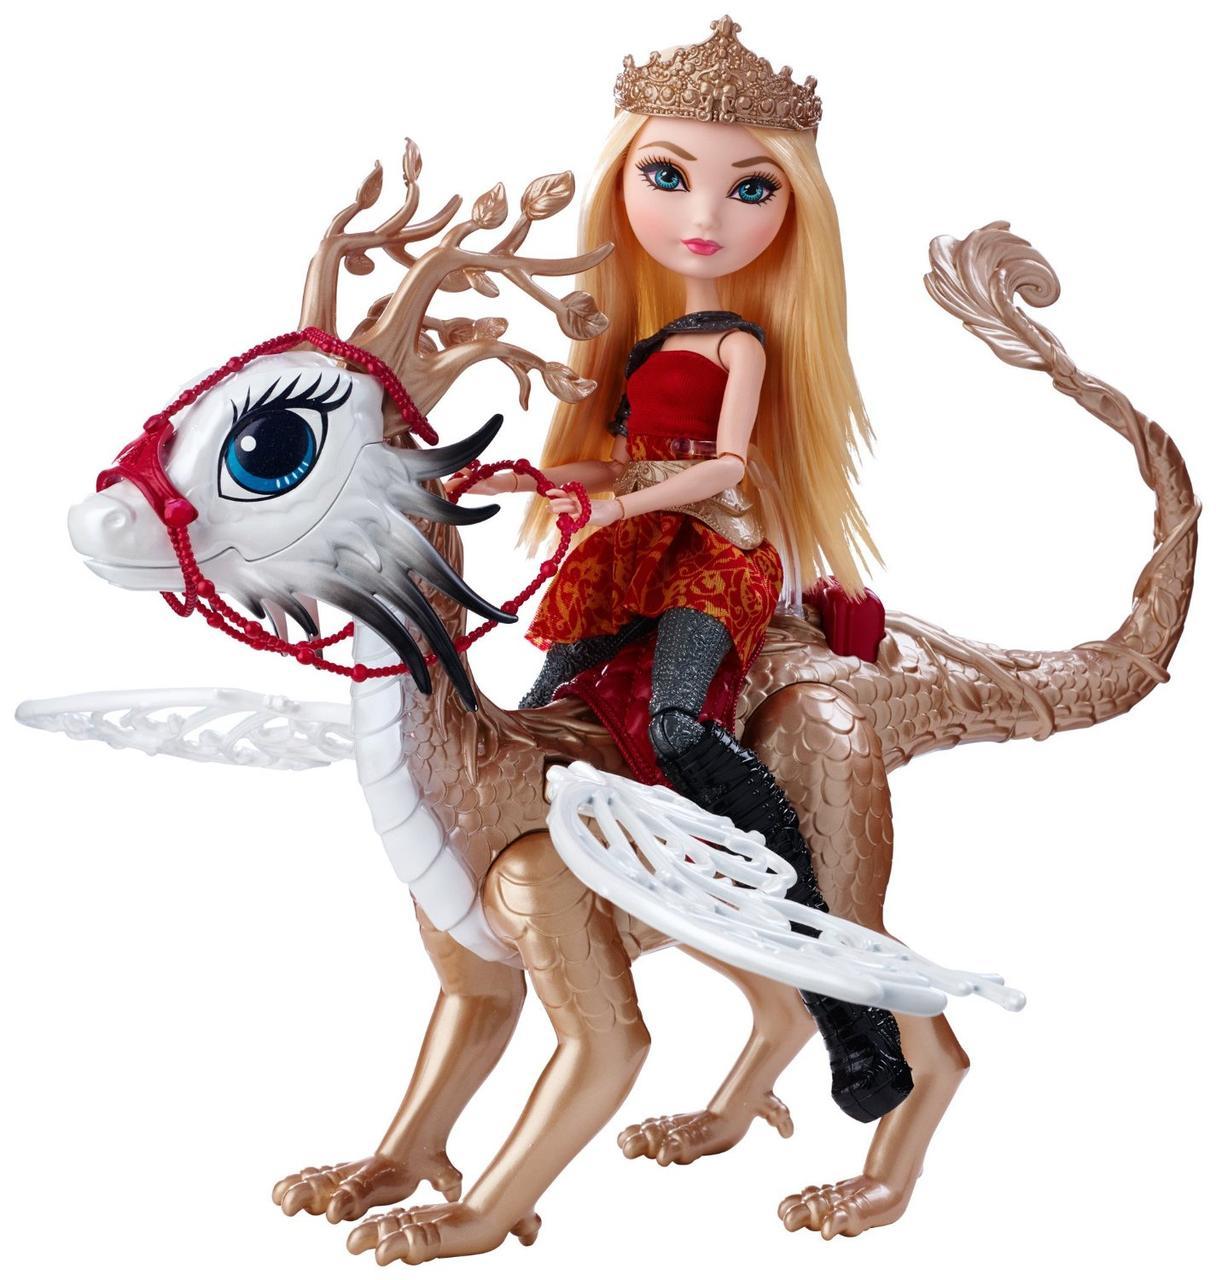 Ever After High Эппл Уайт и дракон Брэбёрн Dragon Games Apple White Doll and Braebyrn Dragon